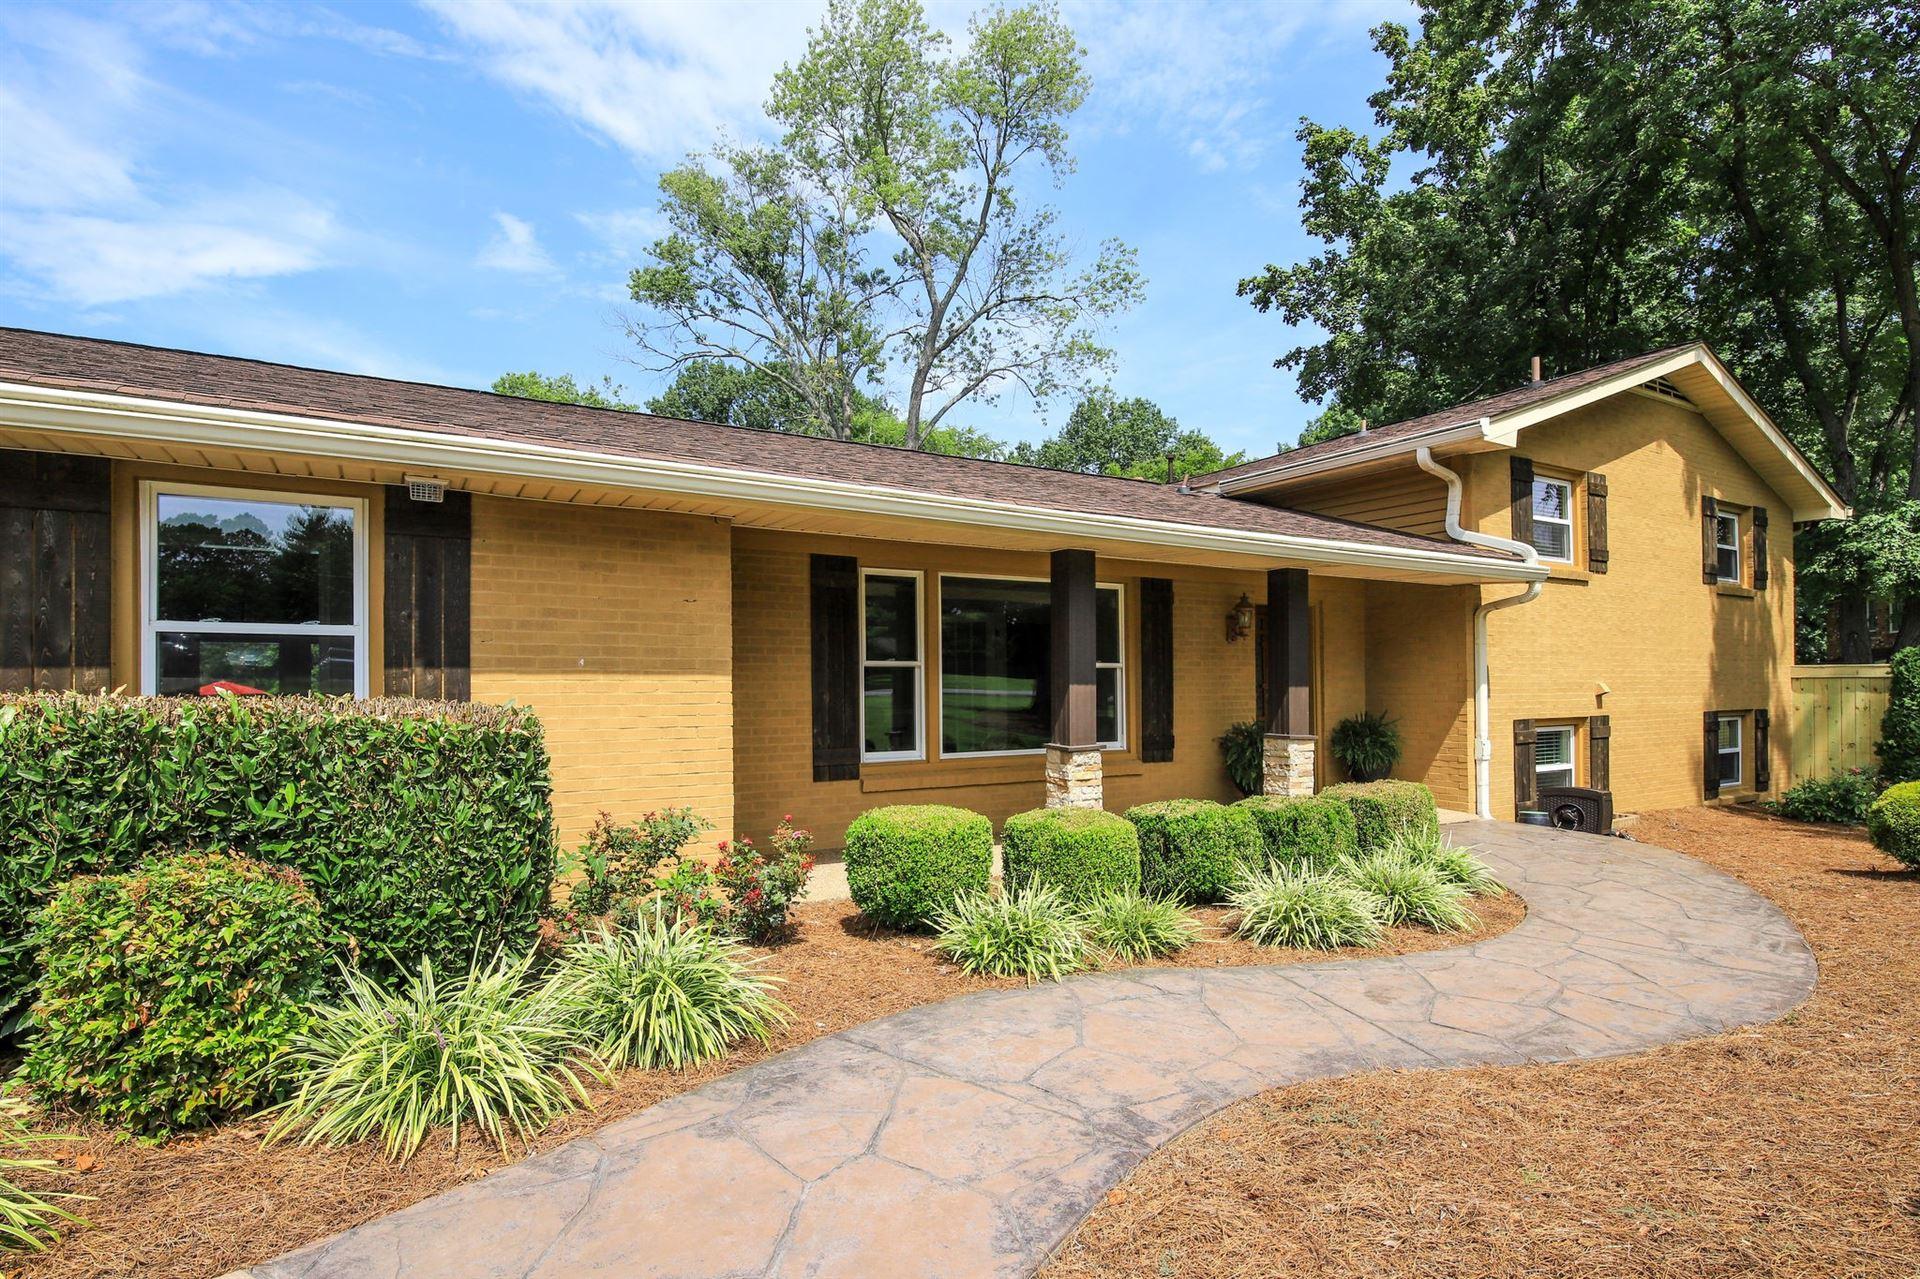 Photo of 192 Cherokee Rd, Hendersonville, TN 37075 (MLS # 2153218)